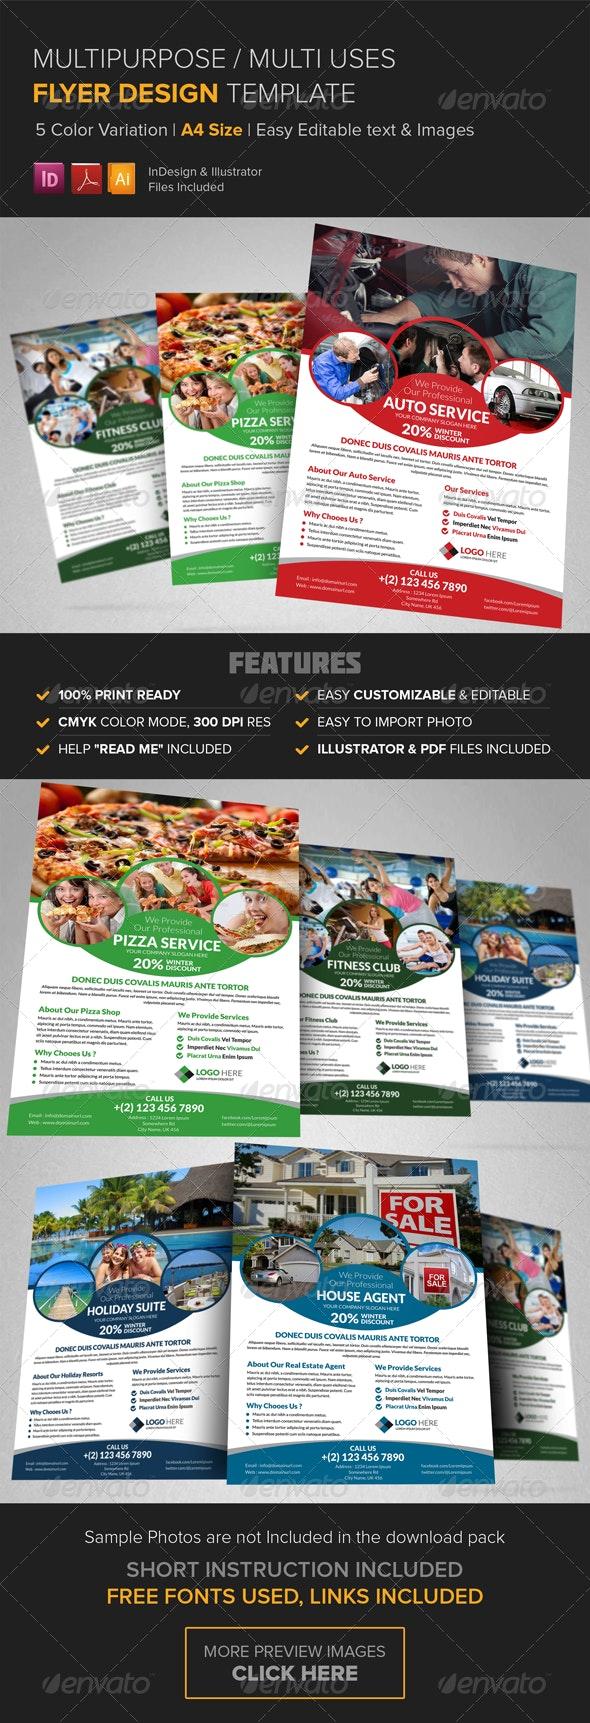 Multipurpose Business Flyer Design Template  - Corporate Flyers